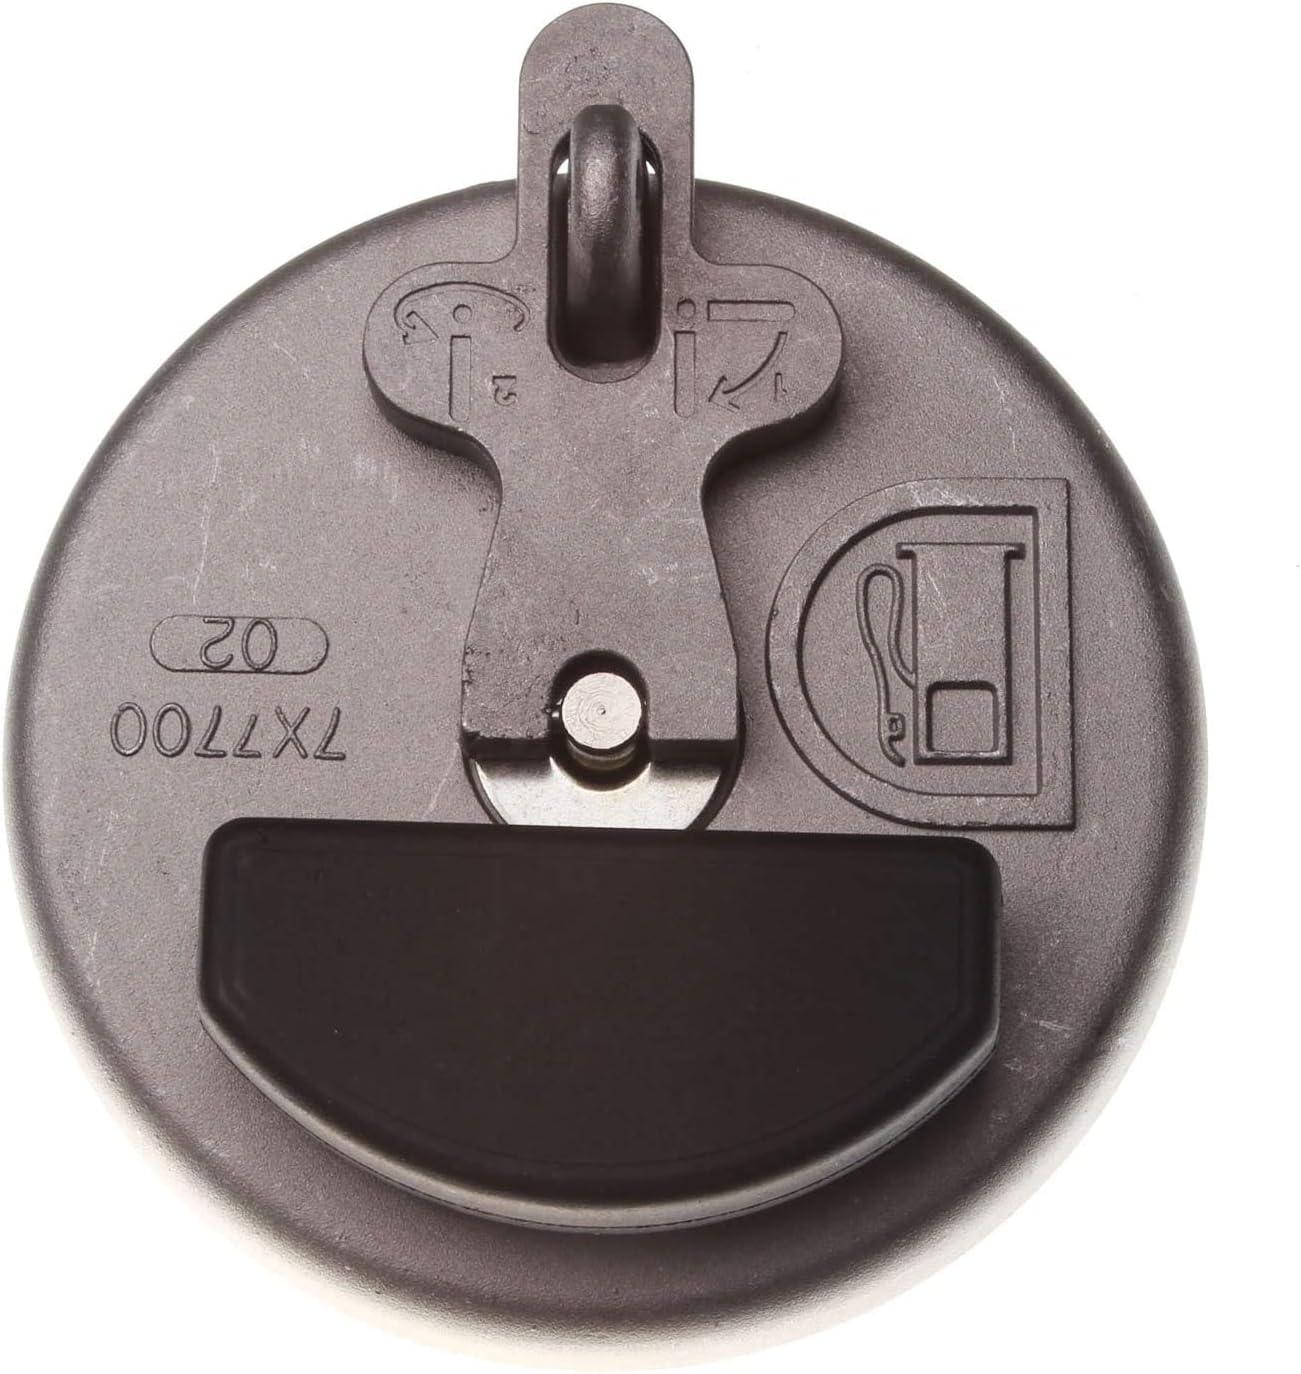 Solarhome Locking Fuel Cap 7X7700 for Caterpillar Excavator 320C Dozers D3C Loaders 931B With 1 Year Warranty